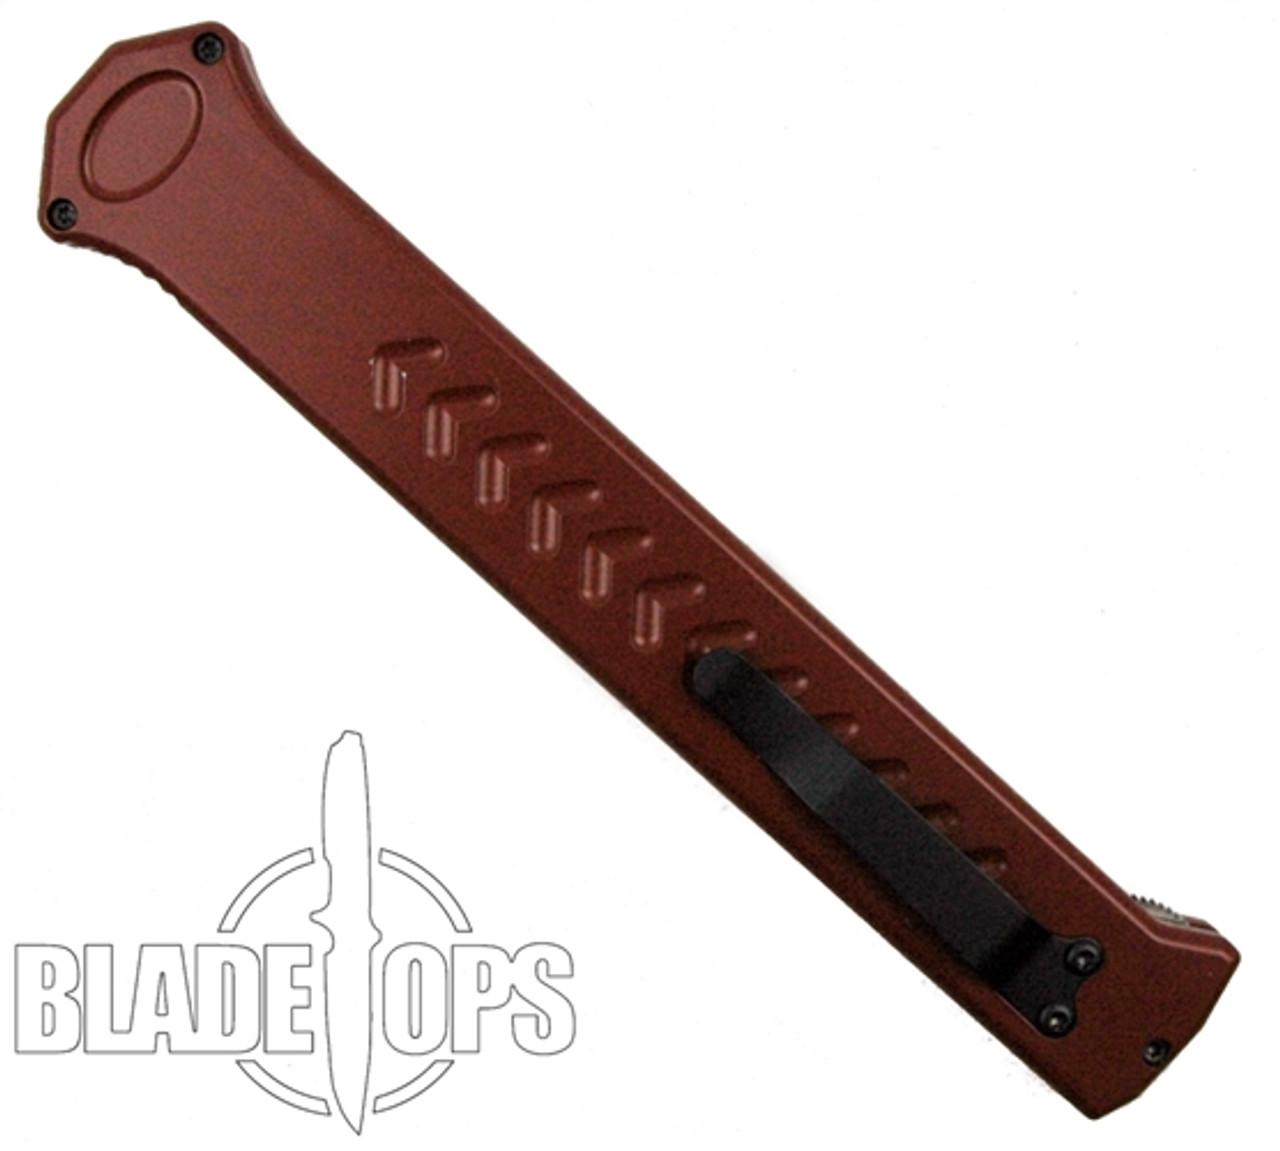 Paragon Red Estiletto OTF Auto Knife, DLC Black Dagger Blade